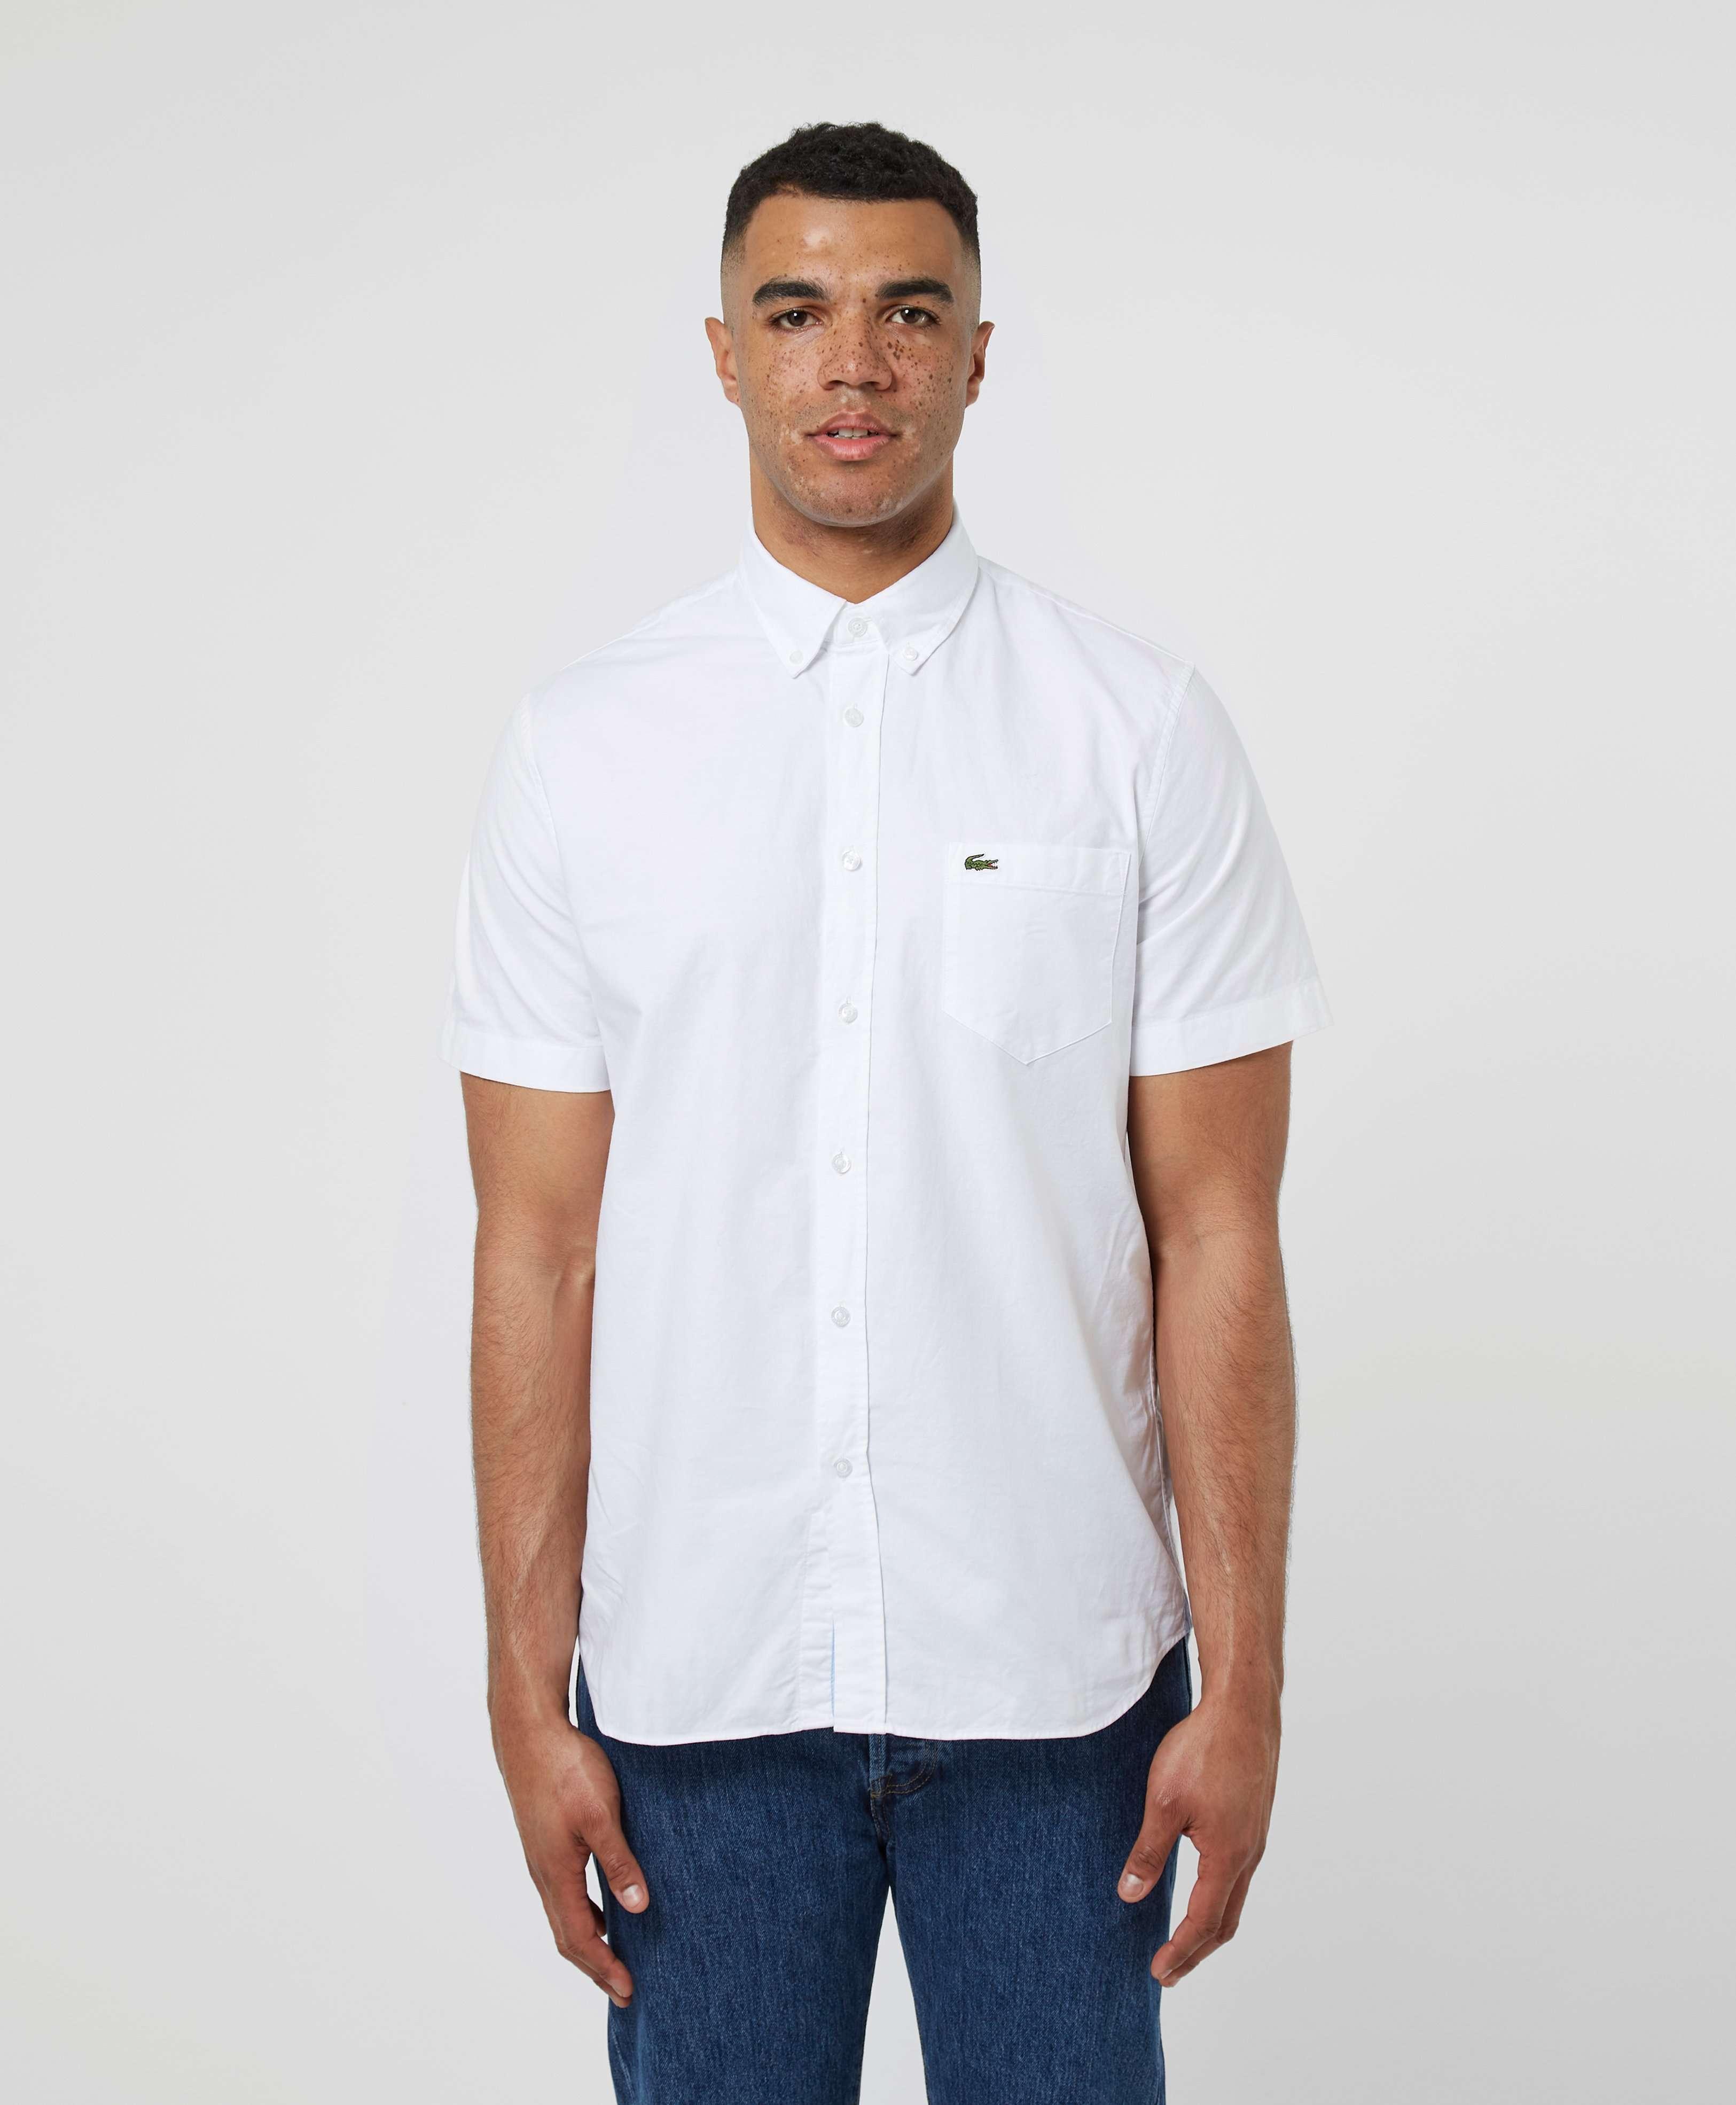 Lacoste Short Sleeve Oxford Shirt